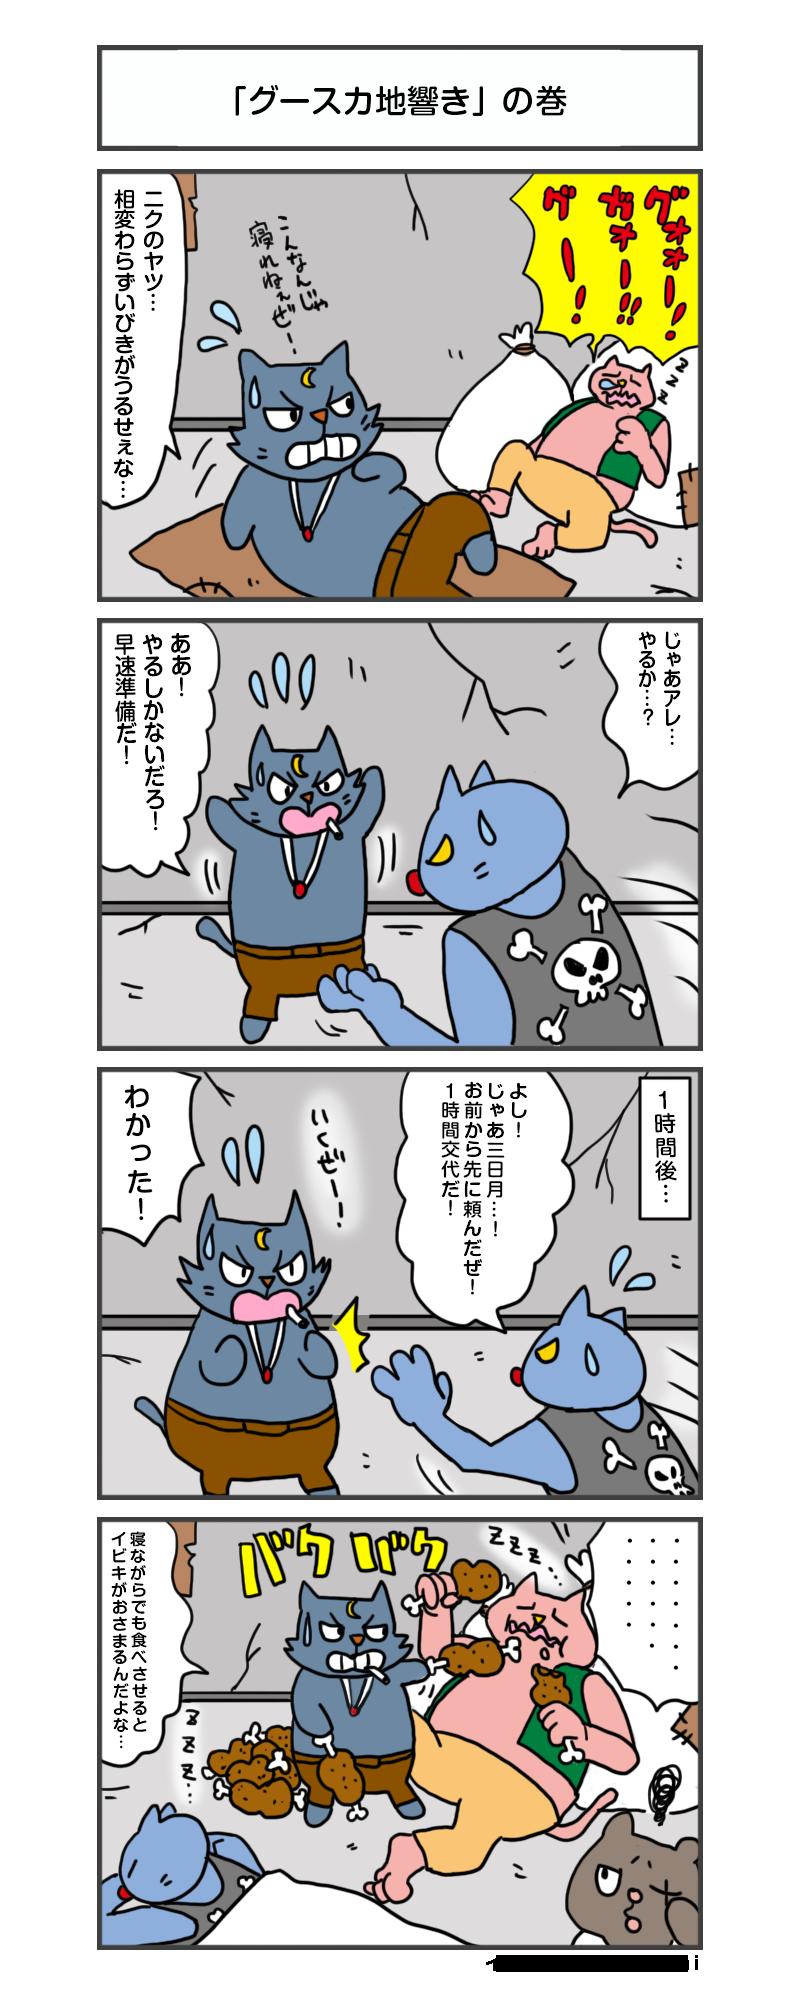 manga_vol.153